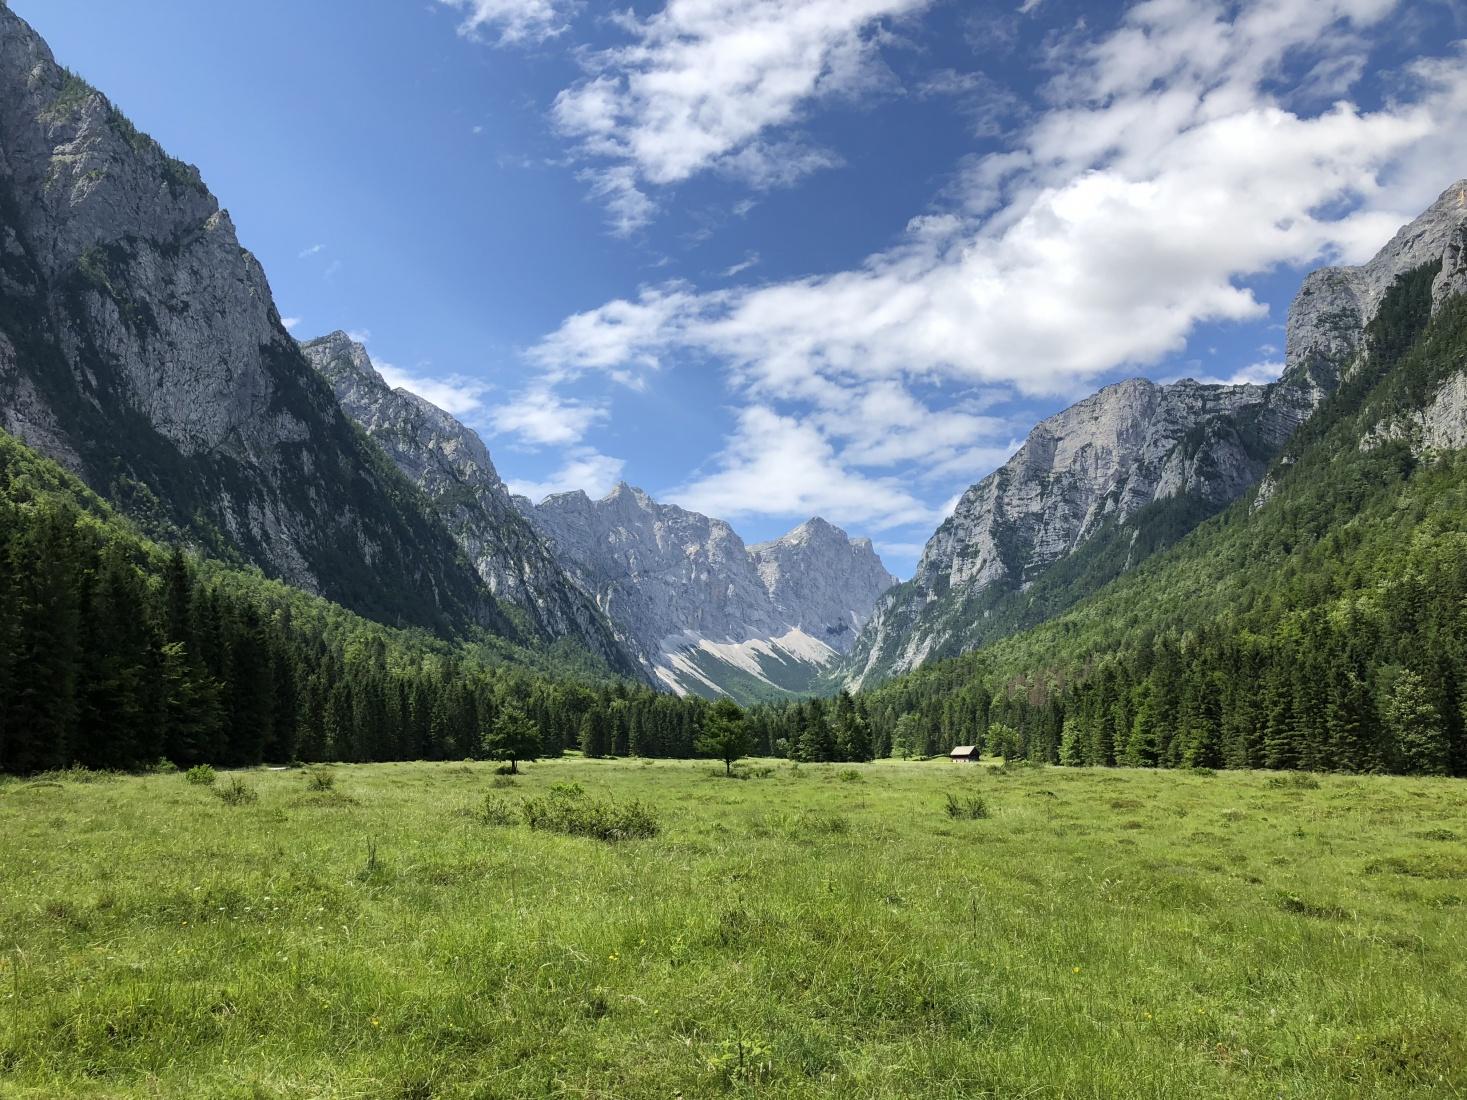 A green meadow and mountain-top photo near the center of Triglav National Park, Slovenia.